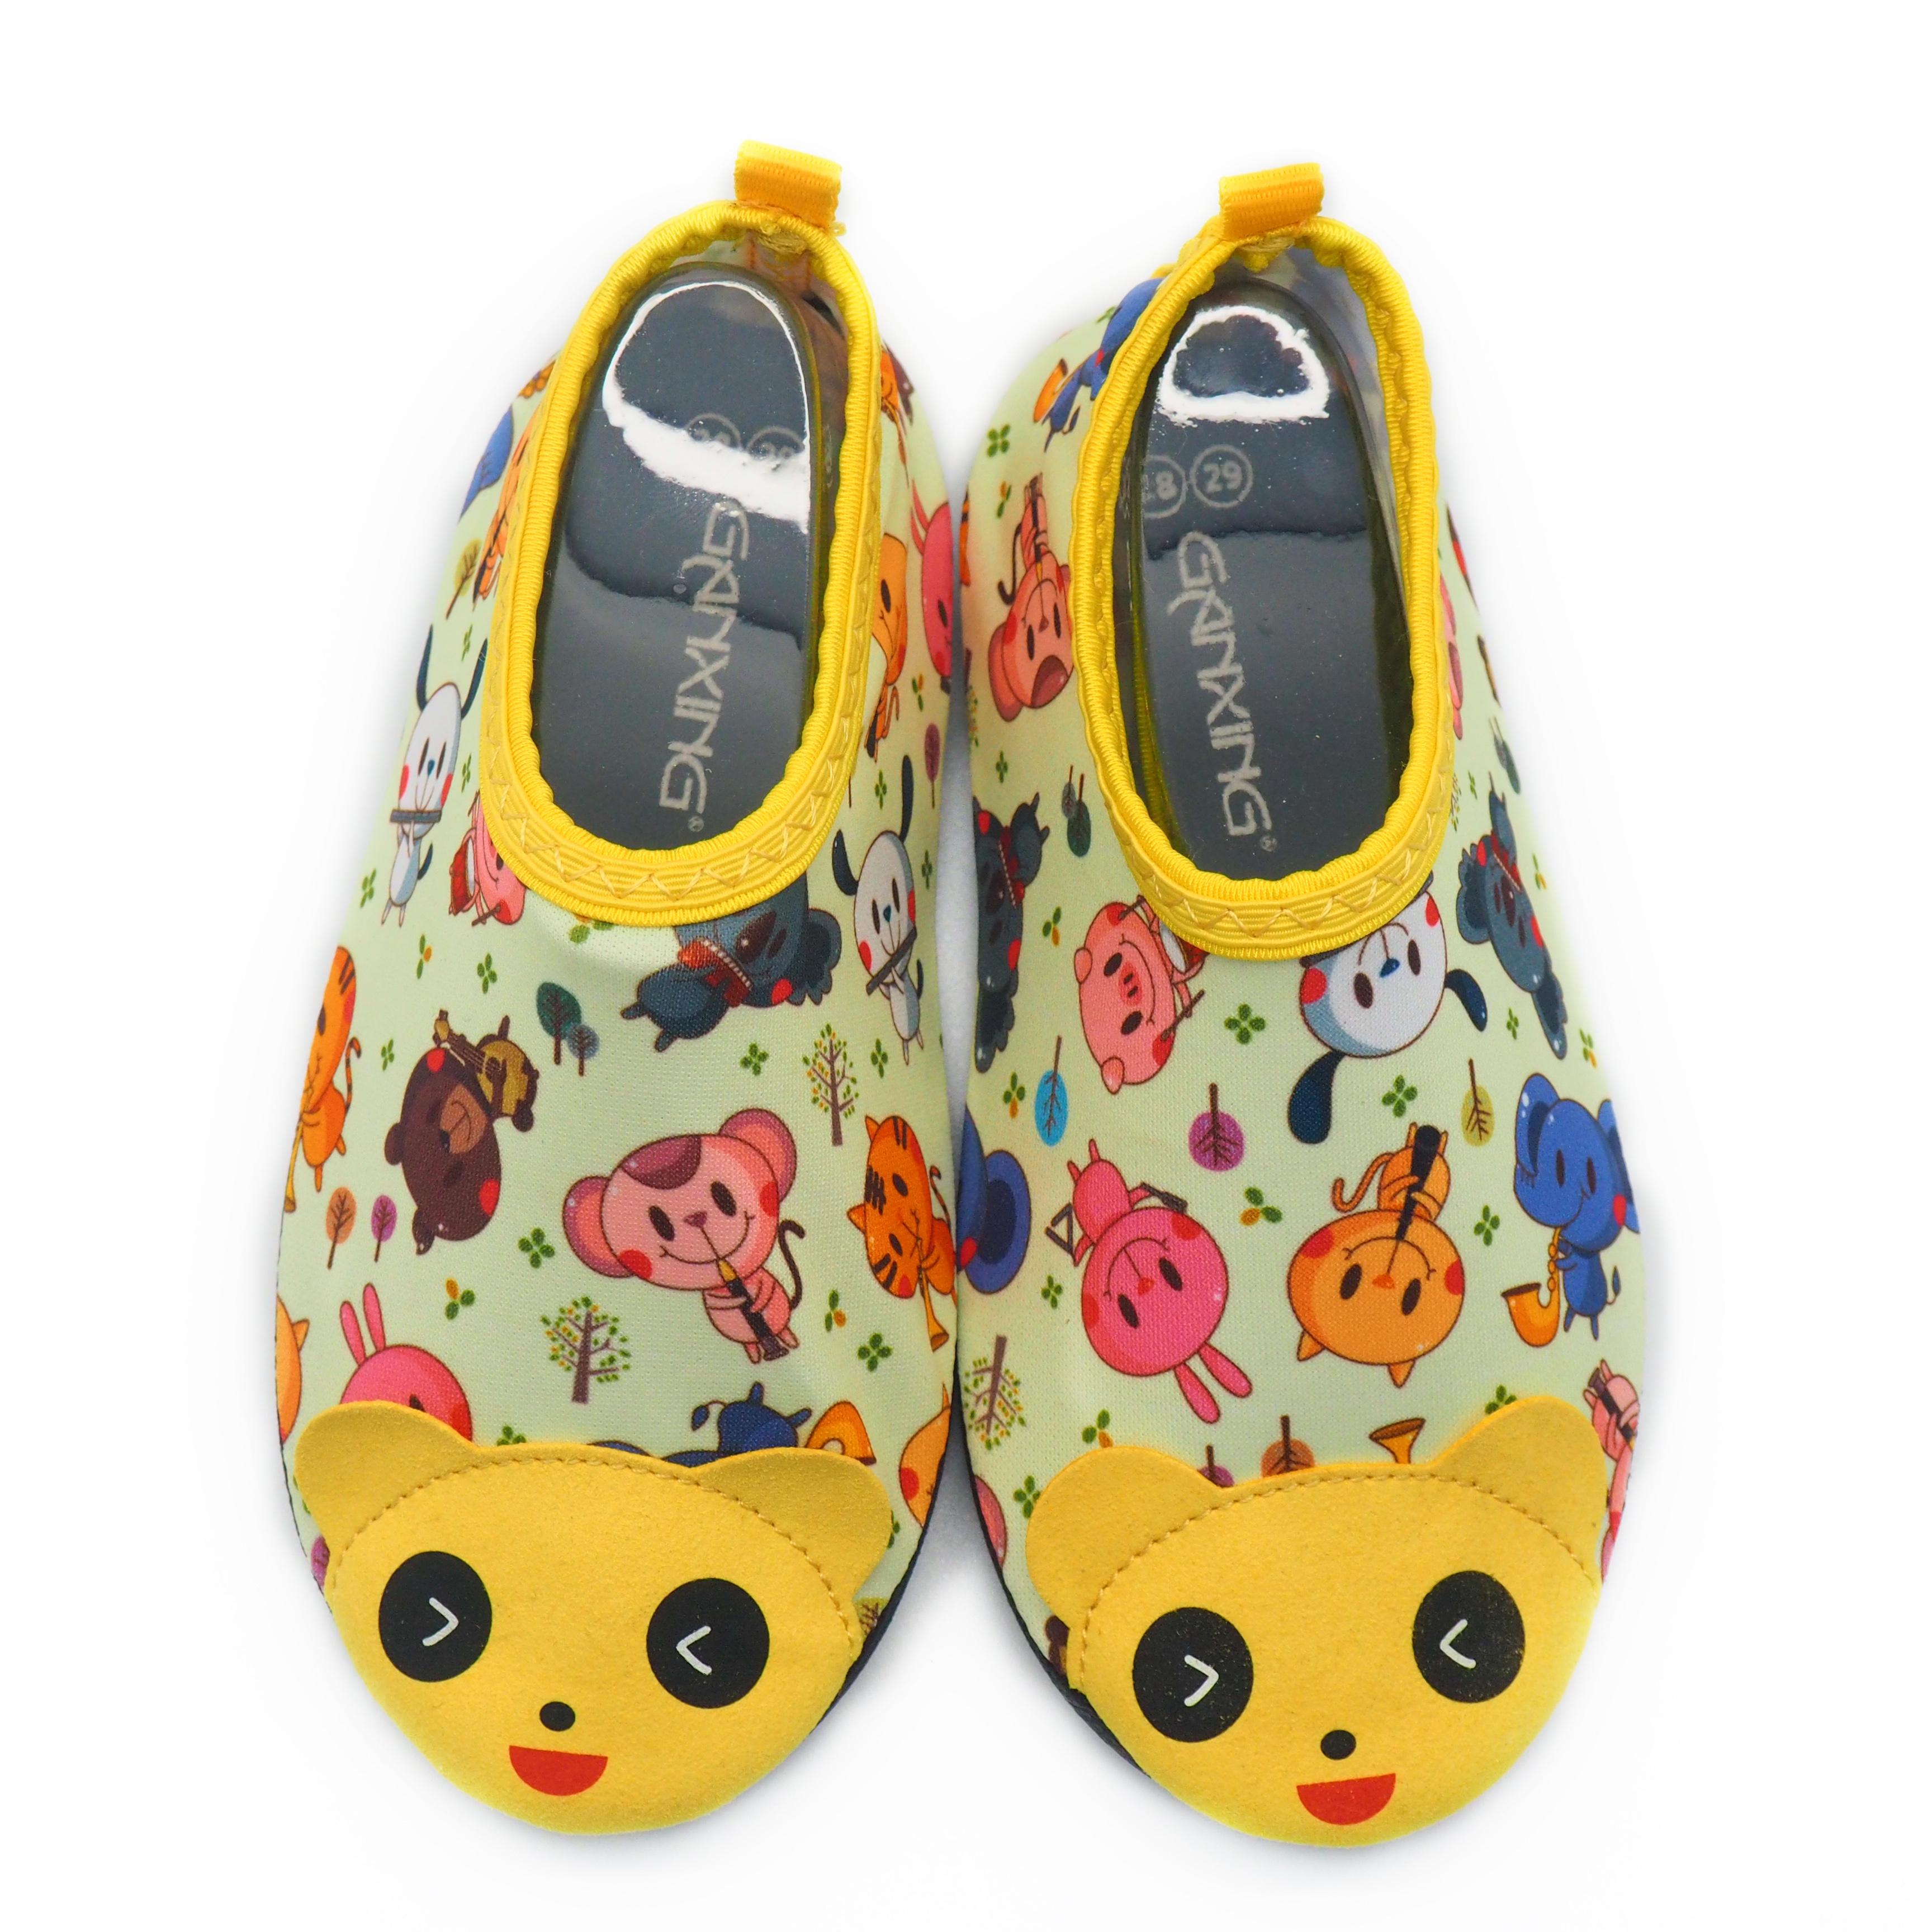 Baby Sea Footwear Multi-Use Beach Pool Socks ANTI SLIP For Babies and Kids